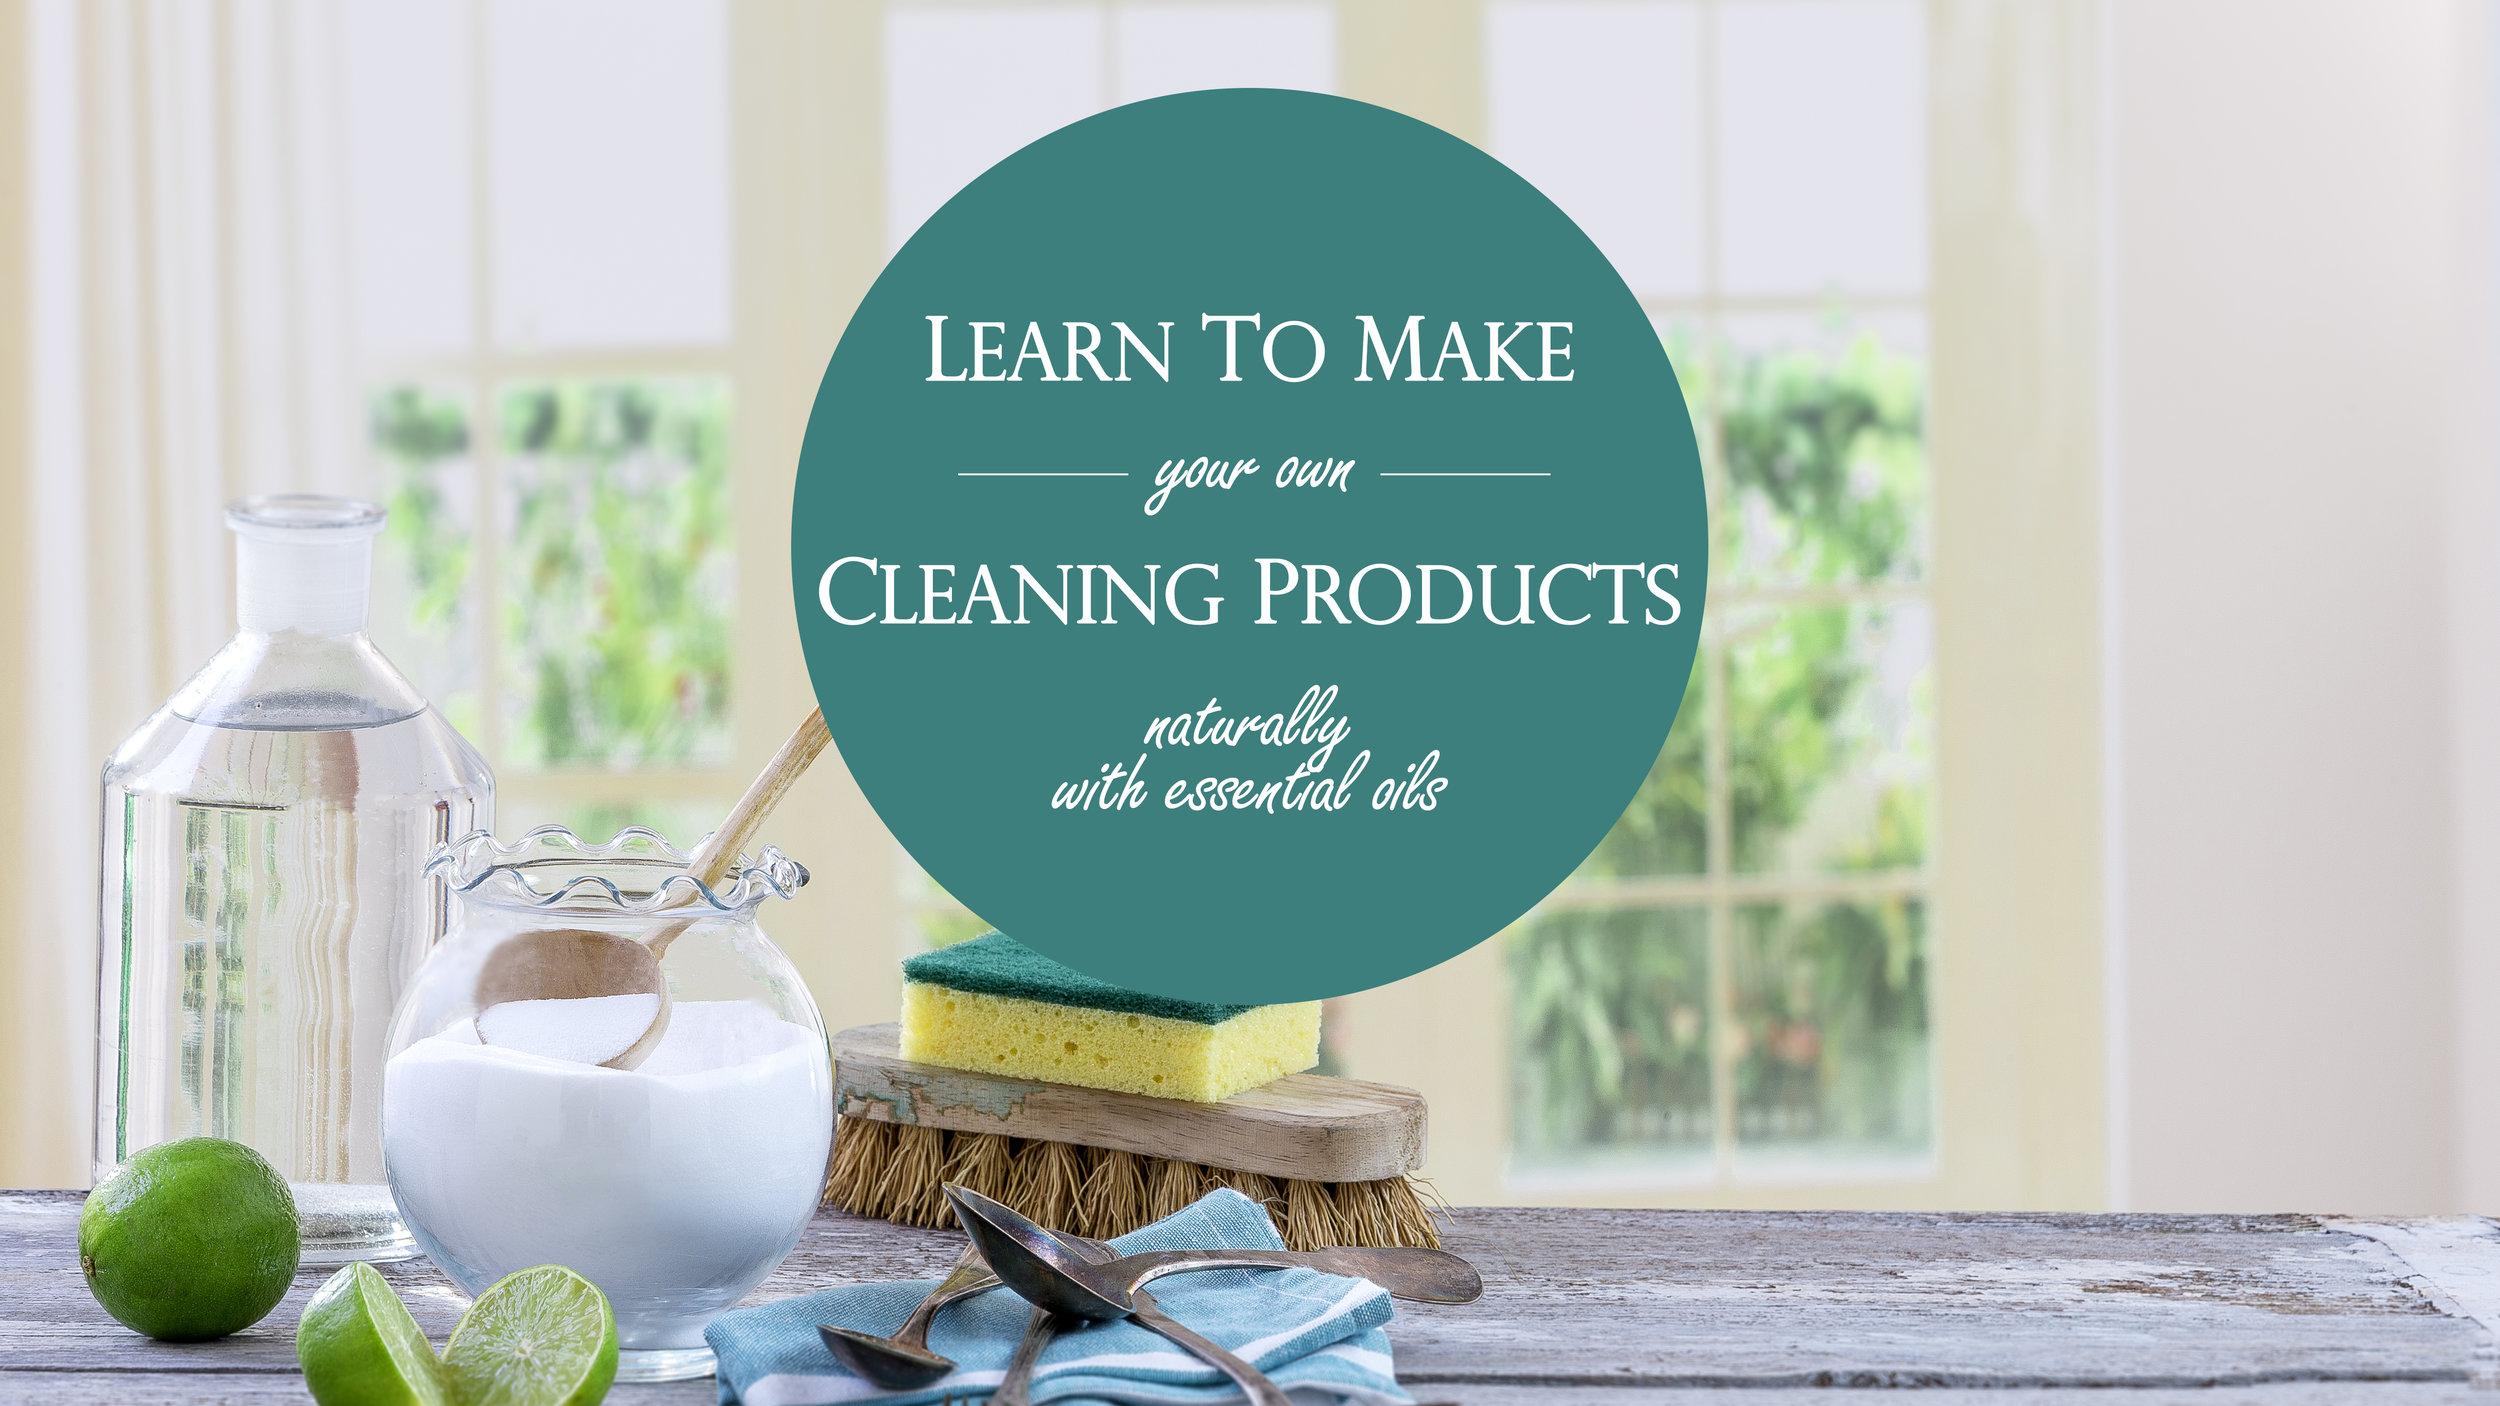 CLEANINGPRODUCTSjpg.jpg